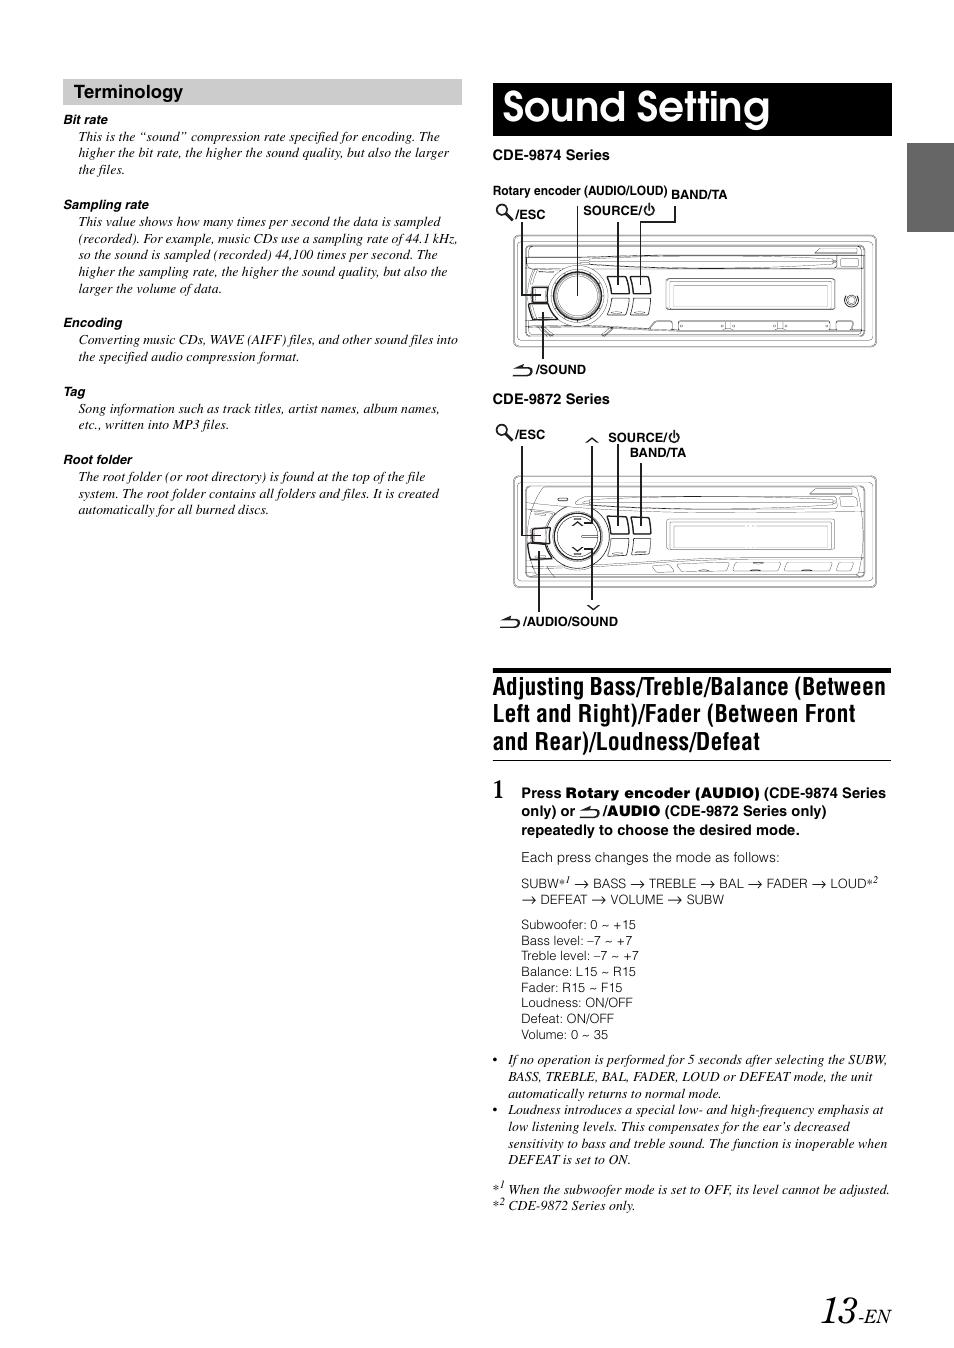 Sound setting, Adjusting bass/treble/balance (between left